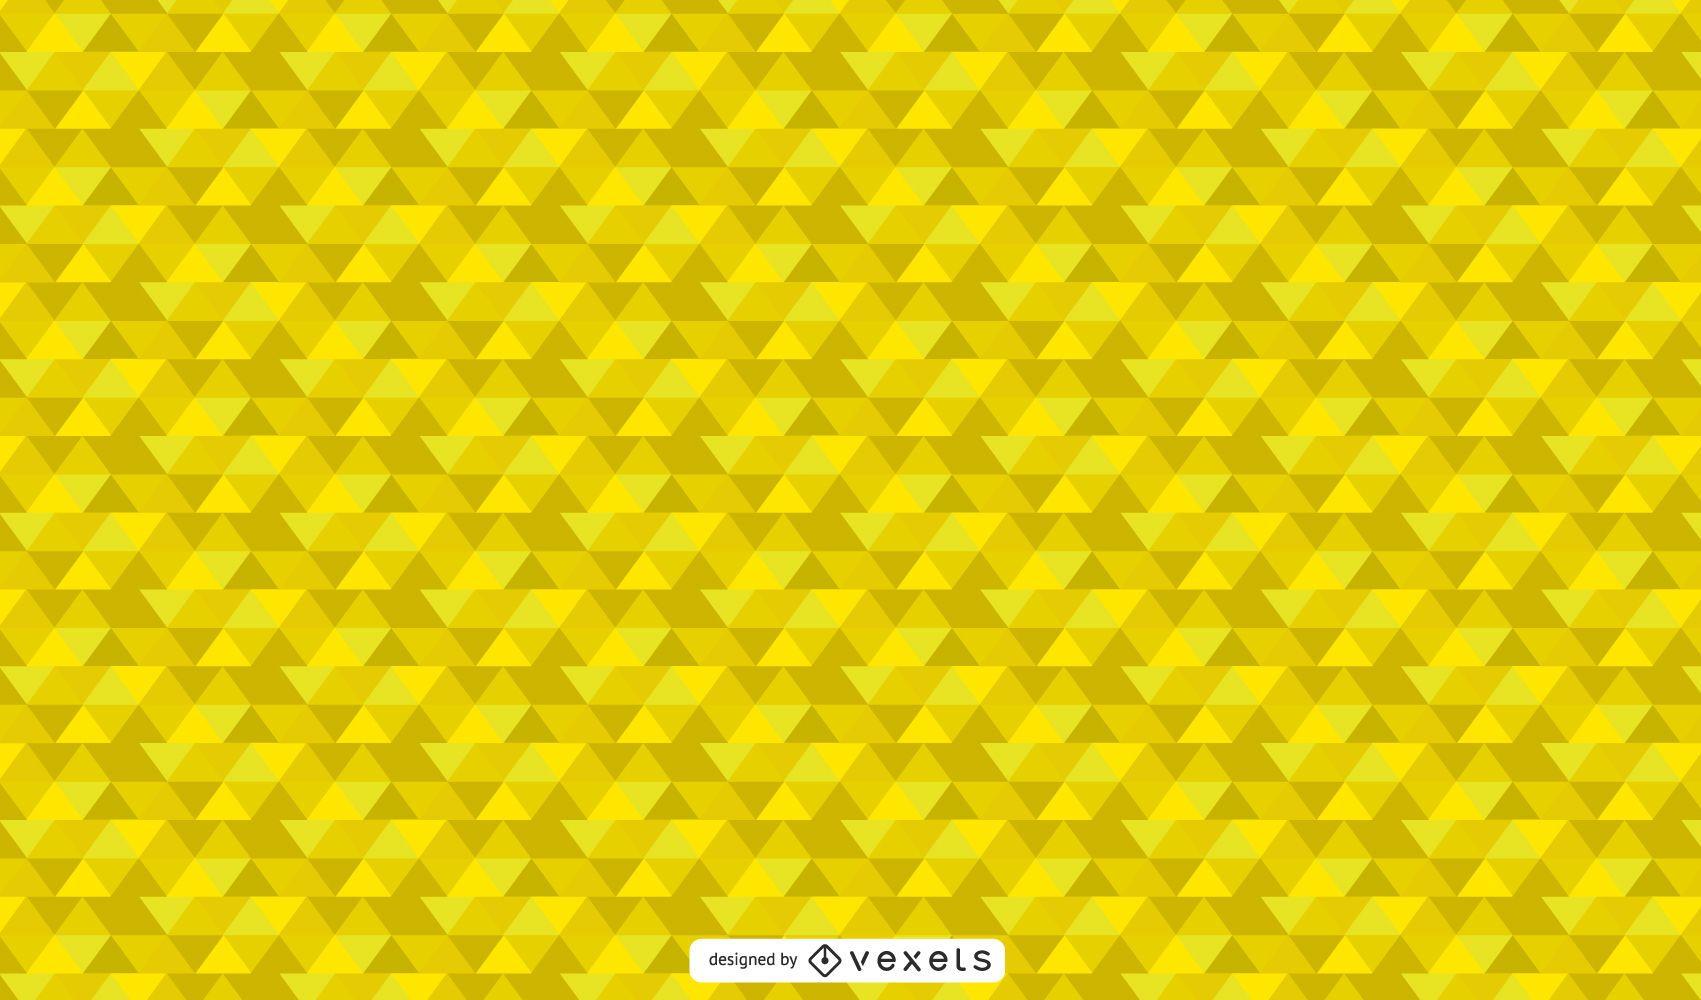 Vibrant Yellow Geometric Abstract Wallpaper